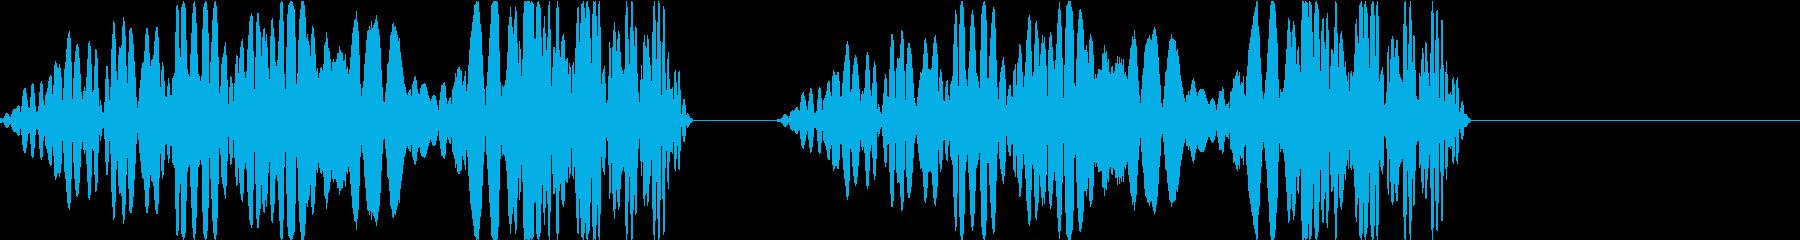 DJプレイ スクラッチ・ノイズ 255の再生済みの波形